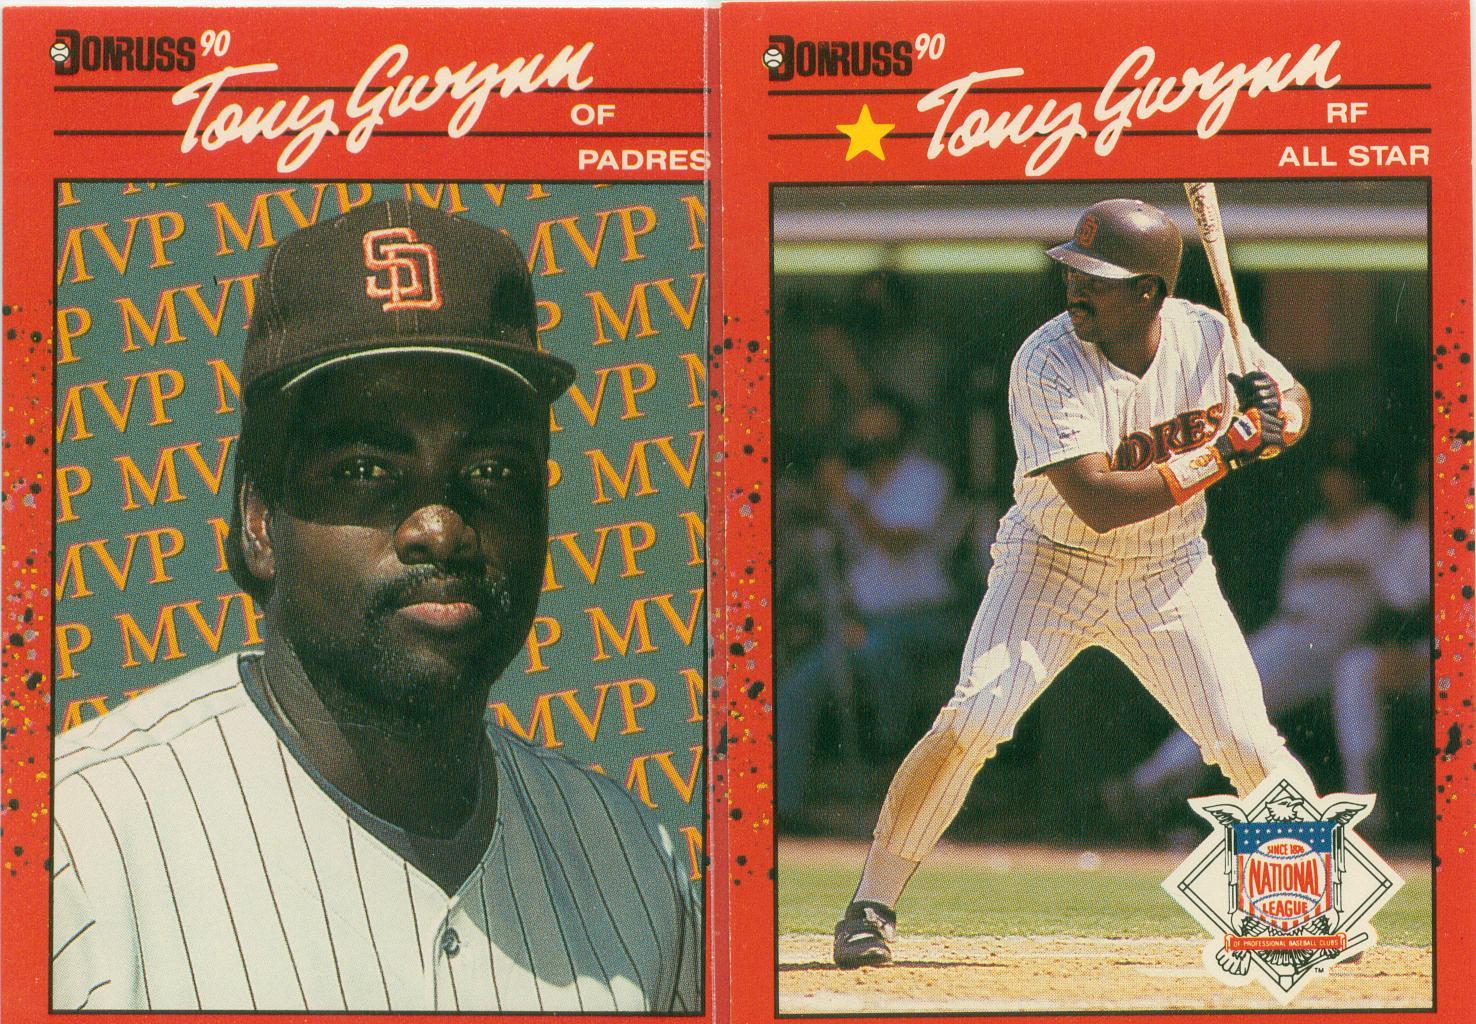 Tony Gwynn 1990 Donruss Pair Mvp All Star 30 Year Old